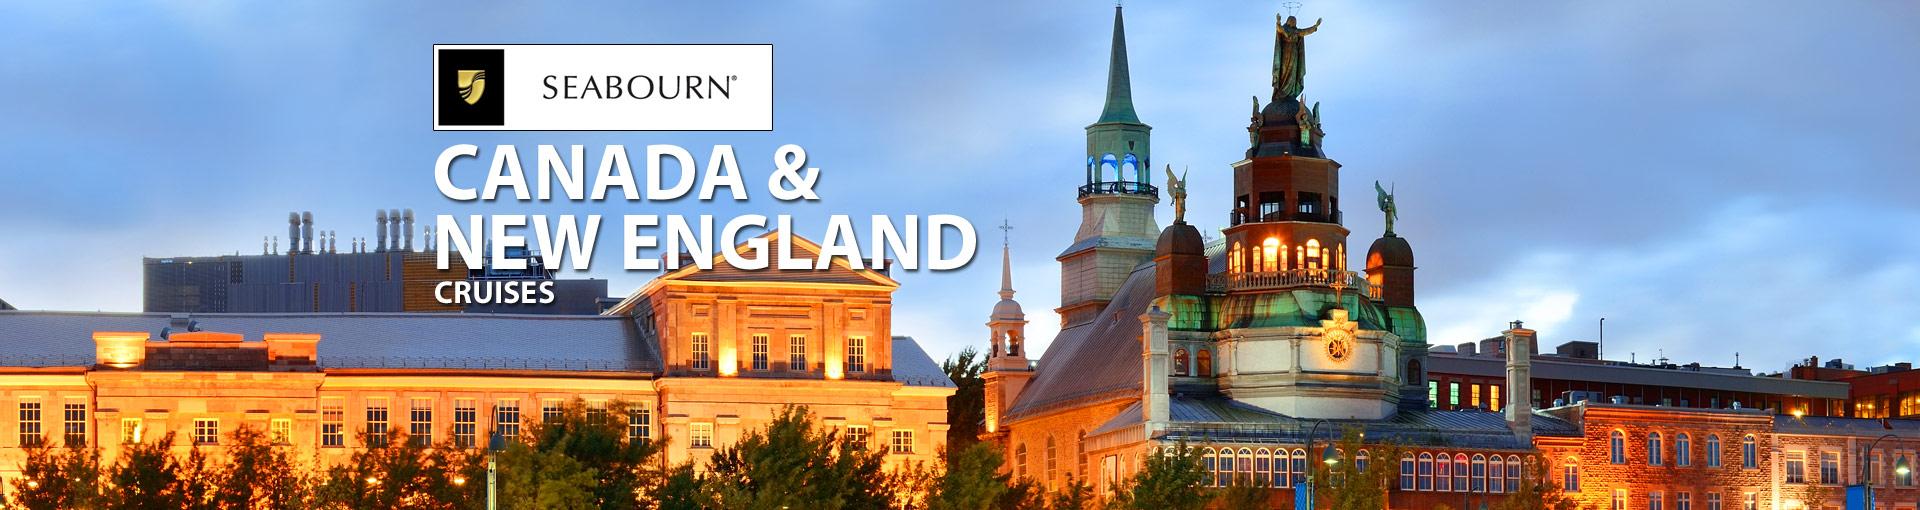 Seabourn Cruise Line Canada / New England Cruises